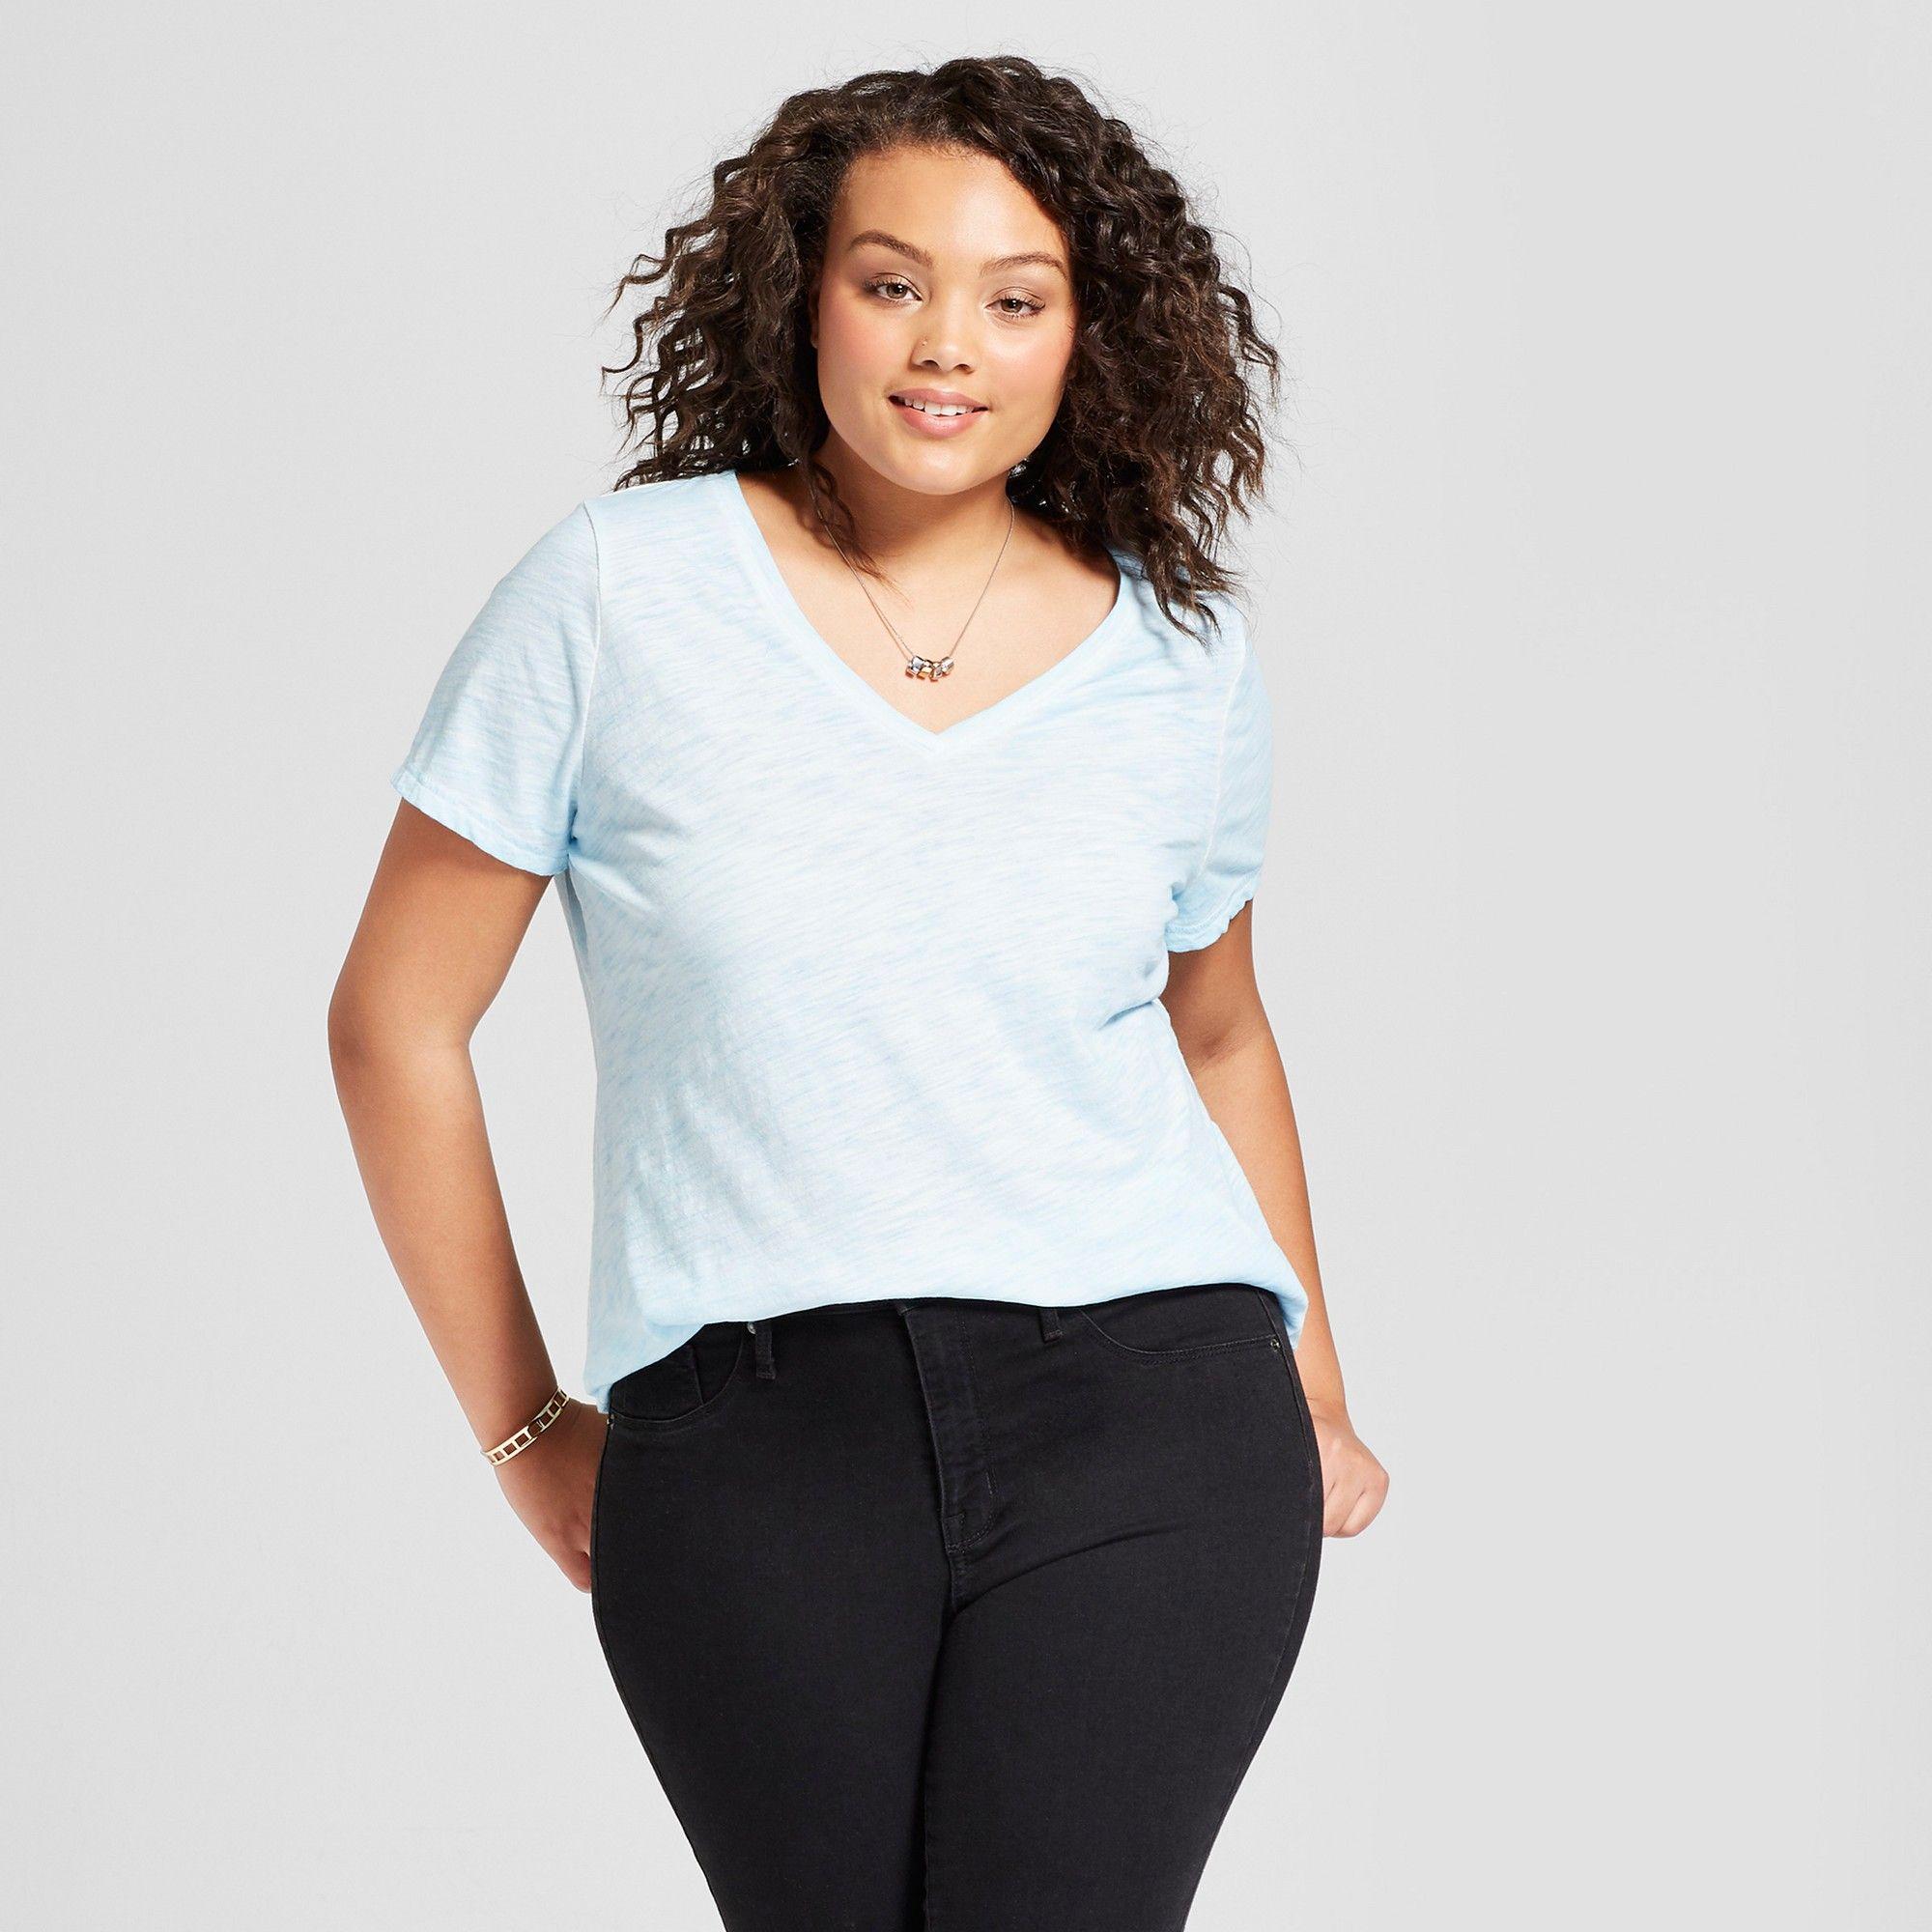 b4c4702baa0 Women s Plus Size V-Neck T-Shirt - Ava   Viv Light Blue 1X ...